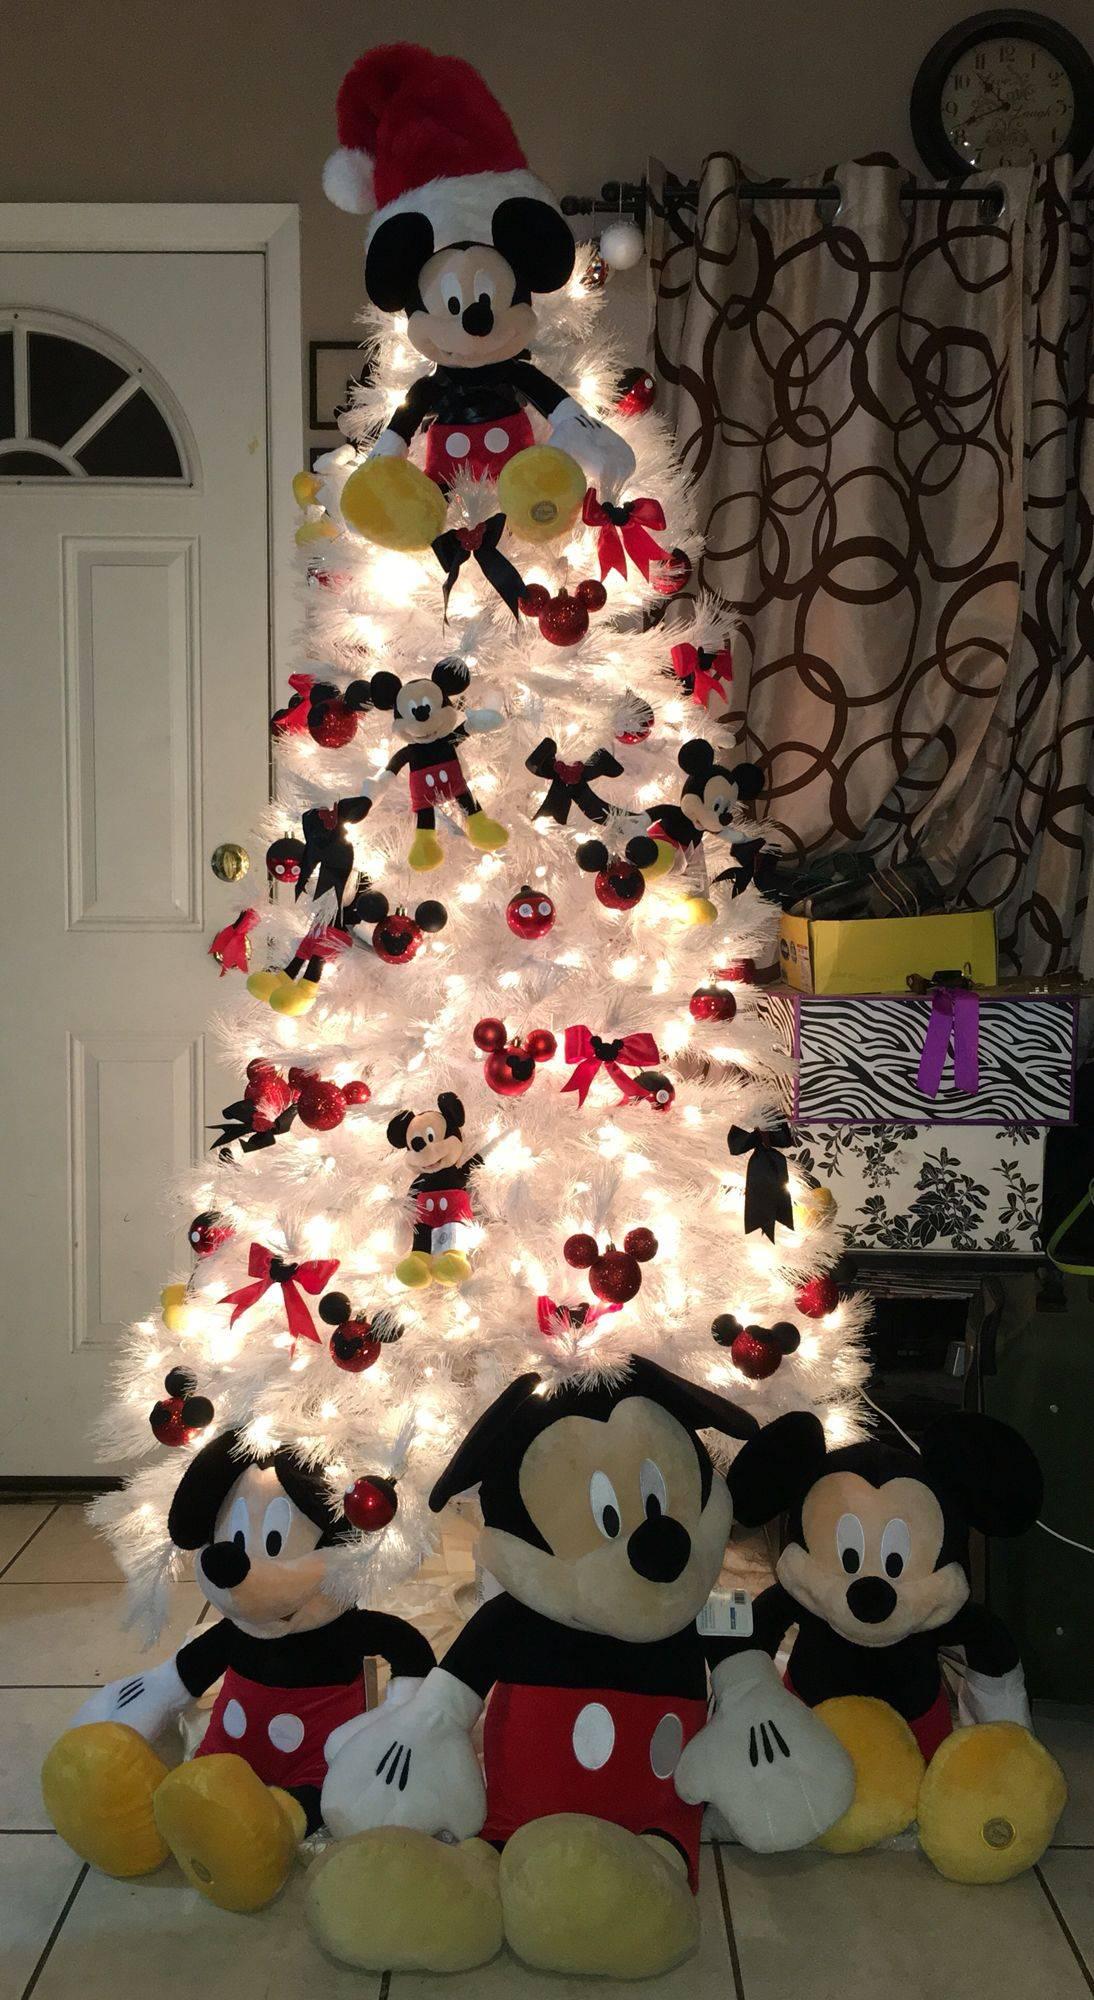 Disney Outdoor Christmas Decorations Inspirational Mickey Mouse Christmas Tree Diy